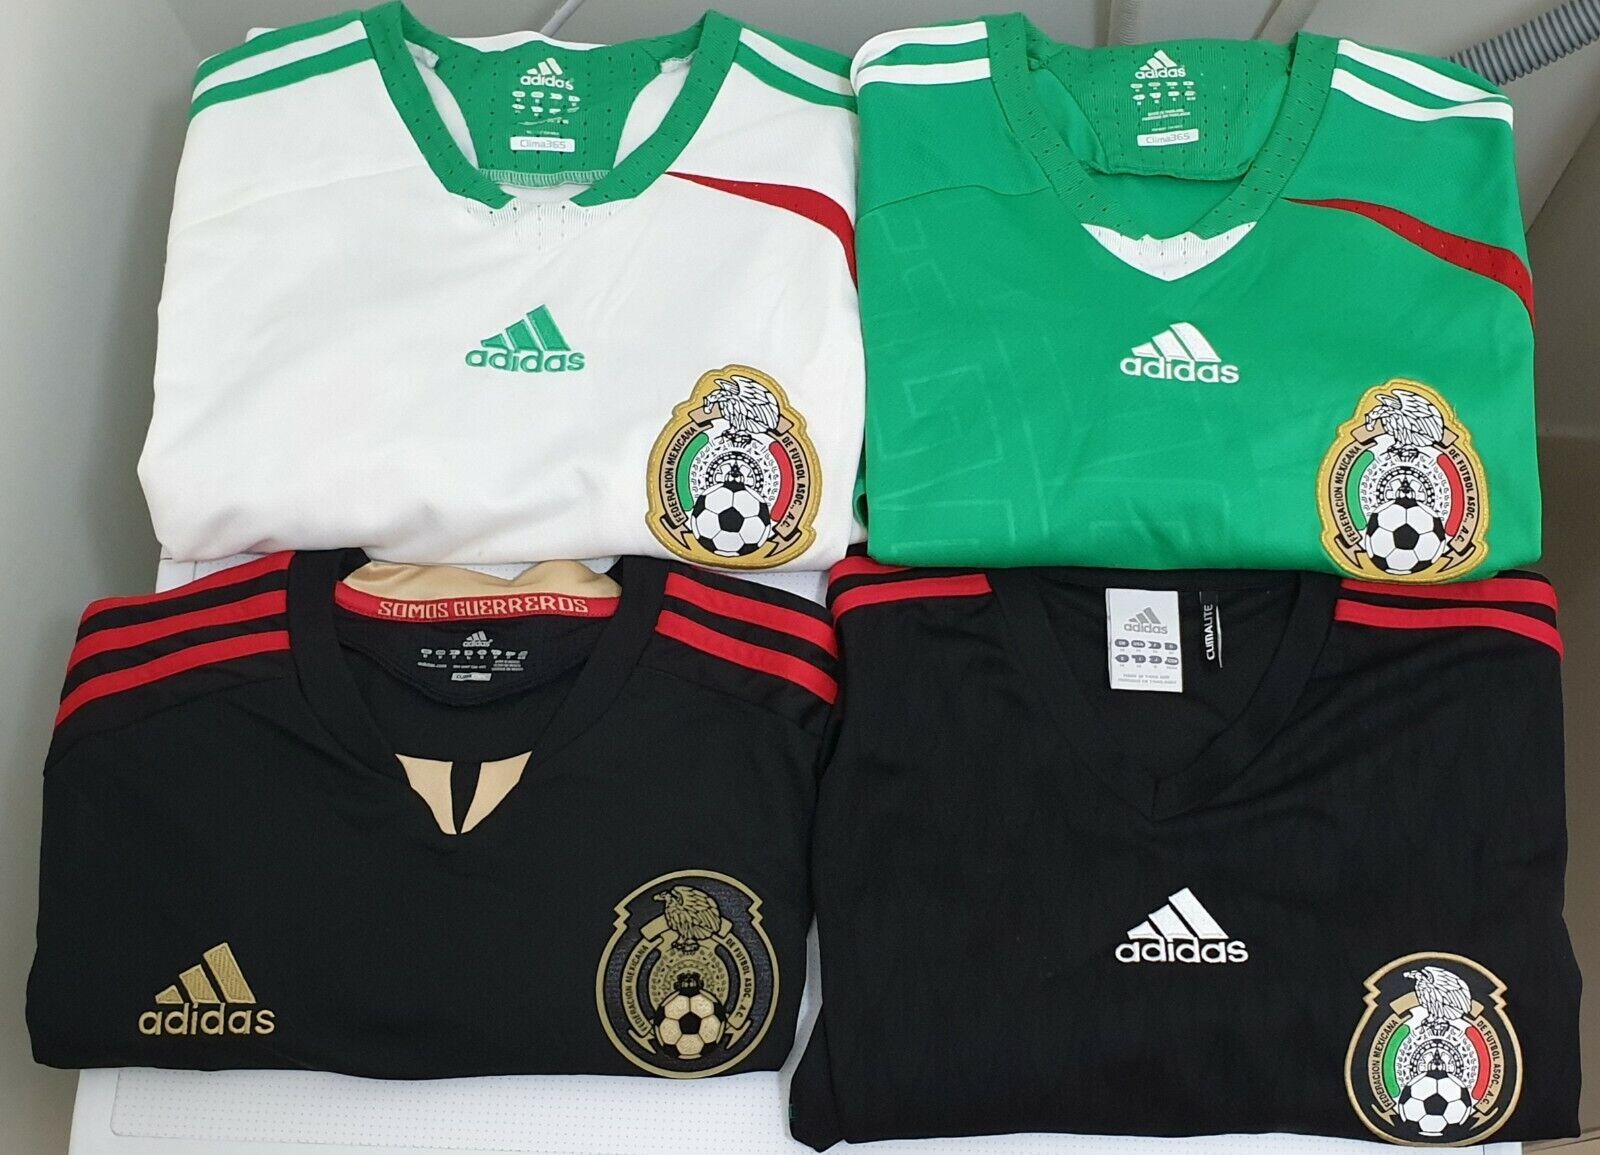 4x ADIDAS Mexico nazionale squadra Soccer Jerseys Diuominiione MEDIUM Authentic & HTF